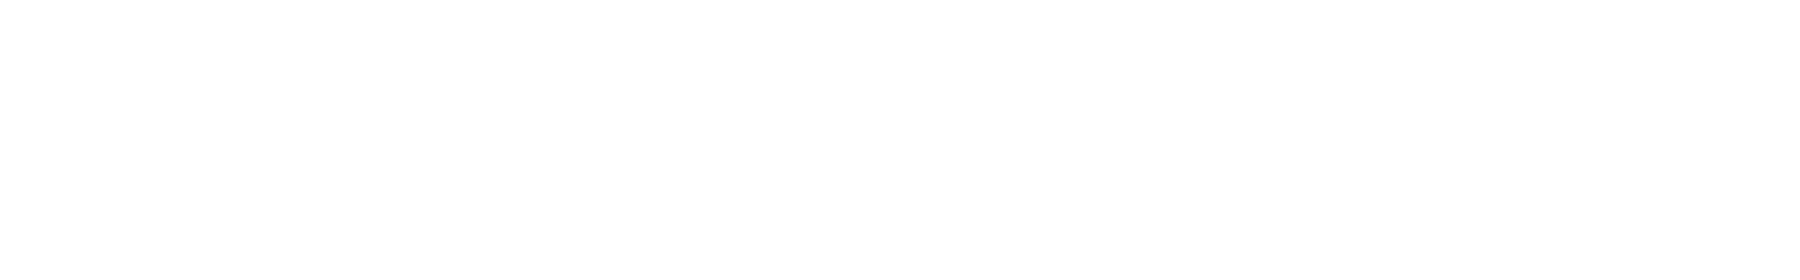 116 b elecgtrarp sp 01